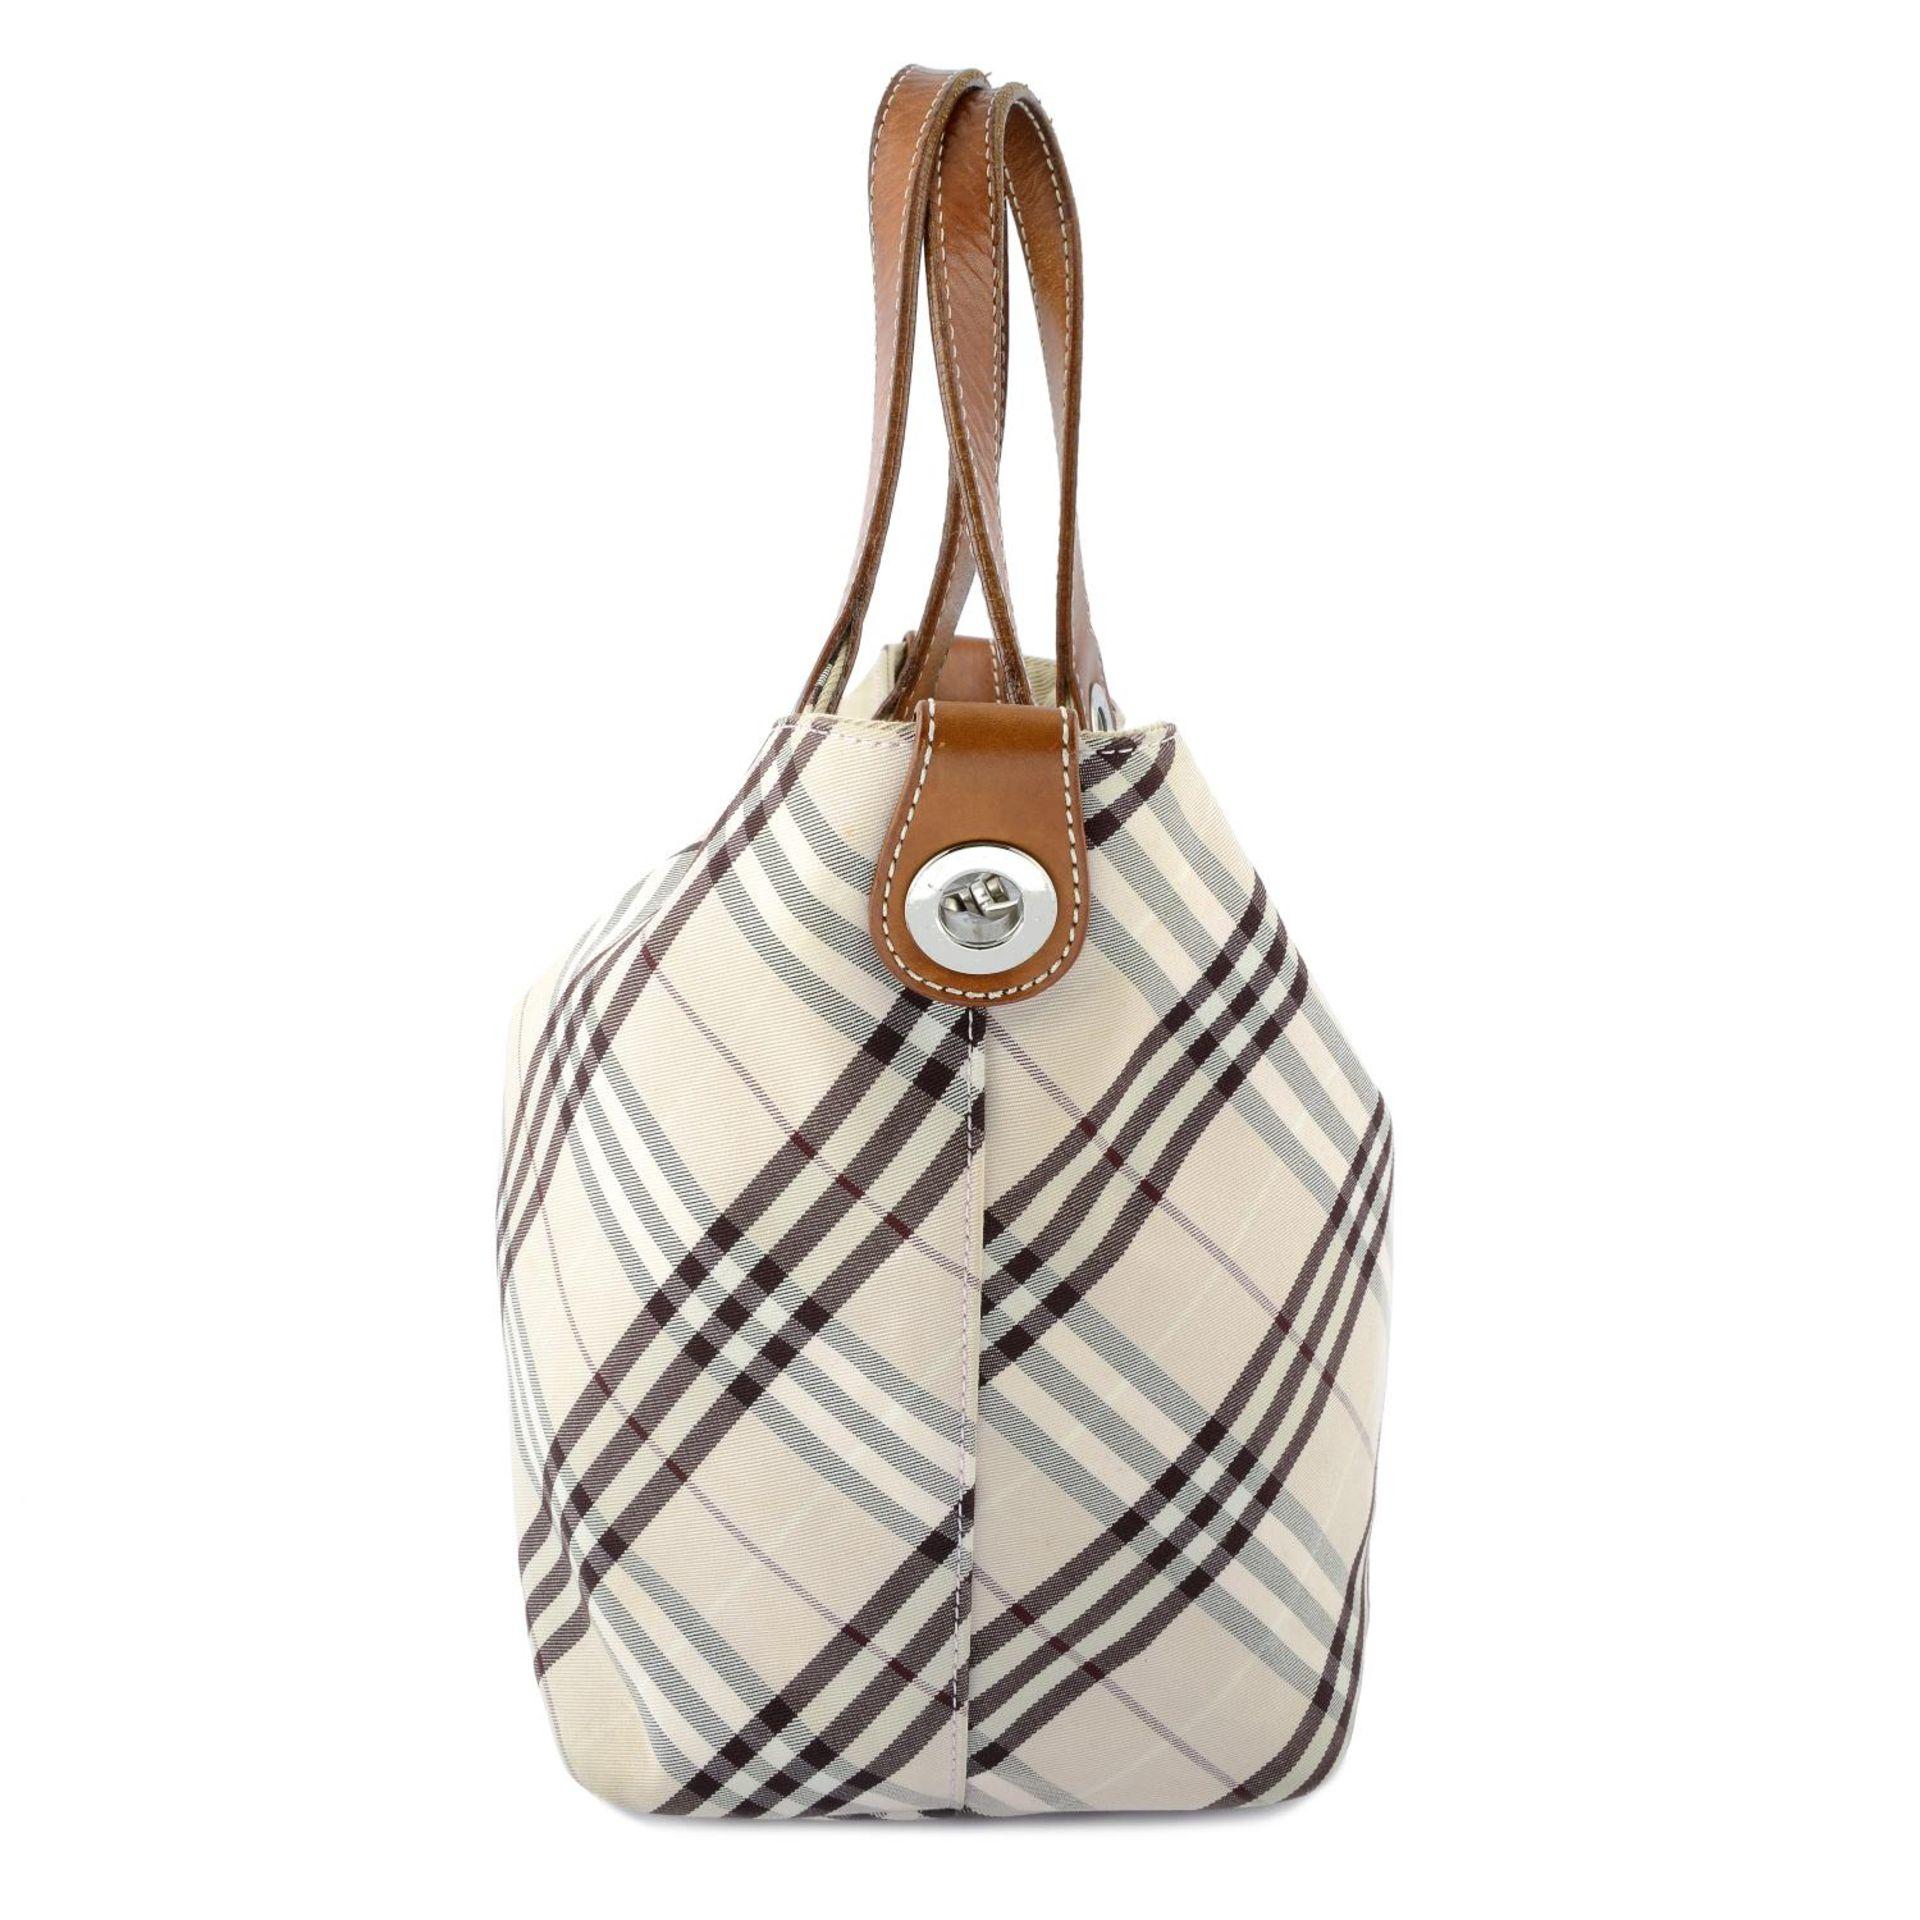 BURBERRY - a Blue Label reversible handbag. - Image 4 of 5